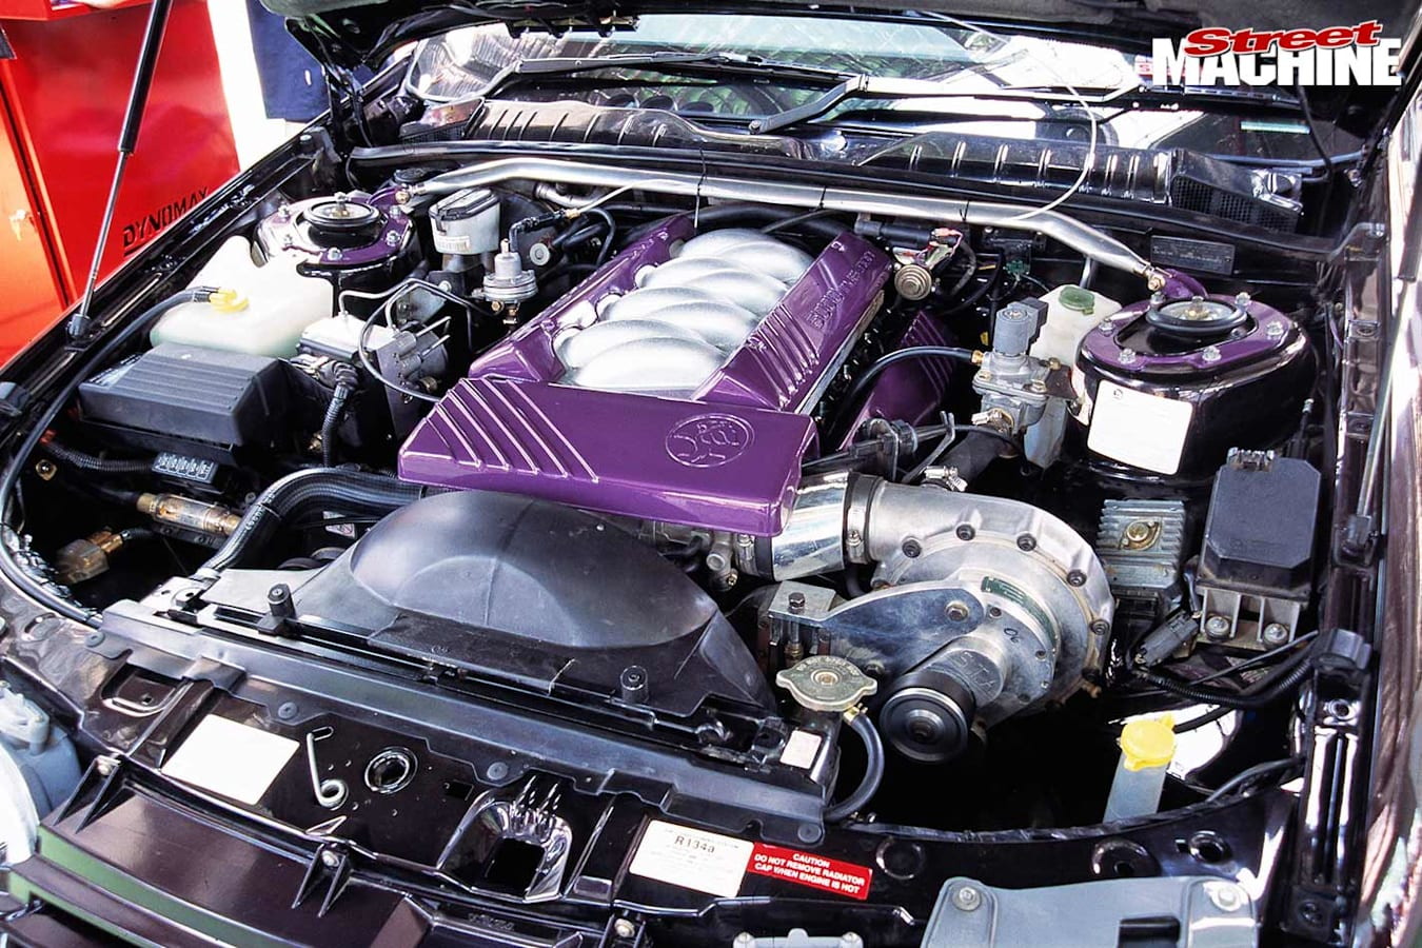 HSV GTS engine bay